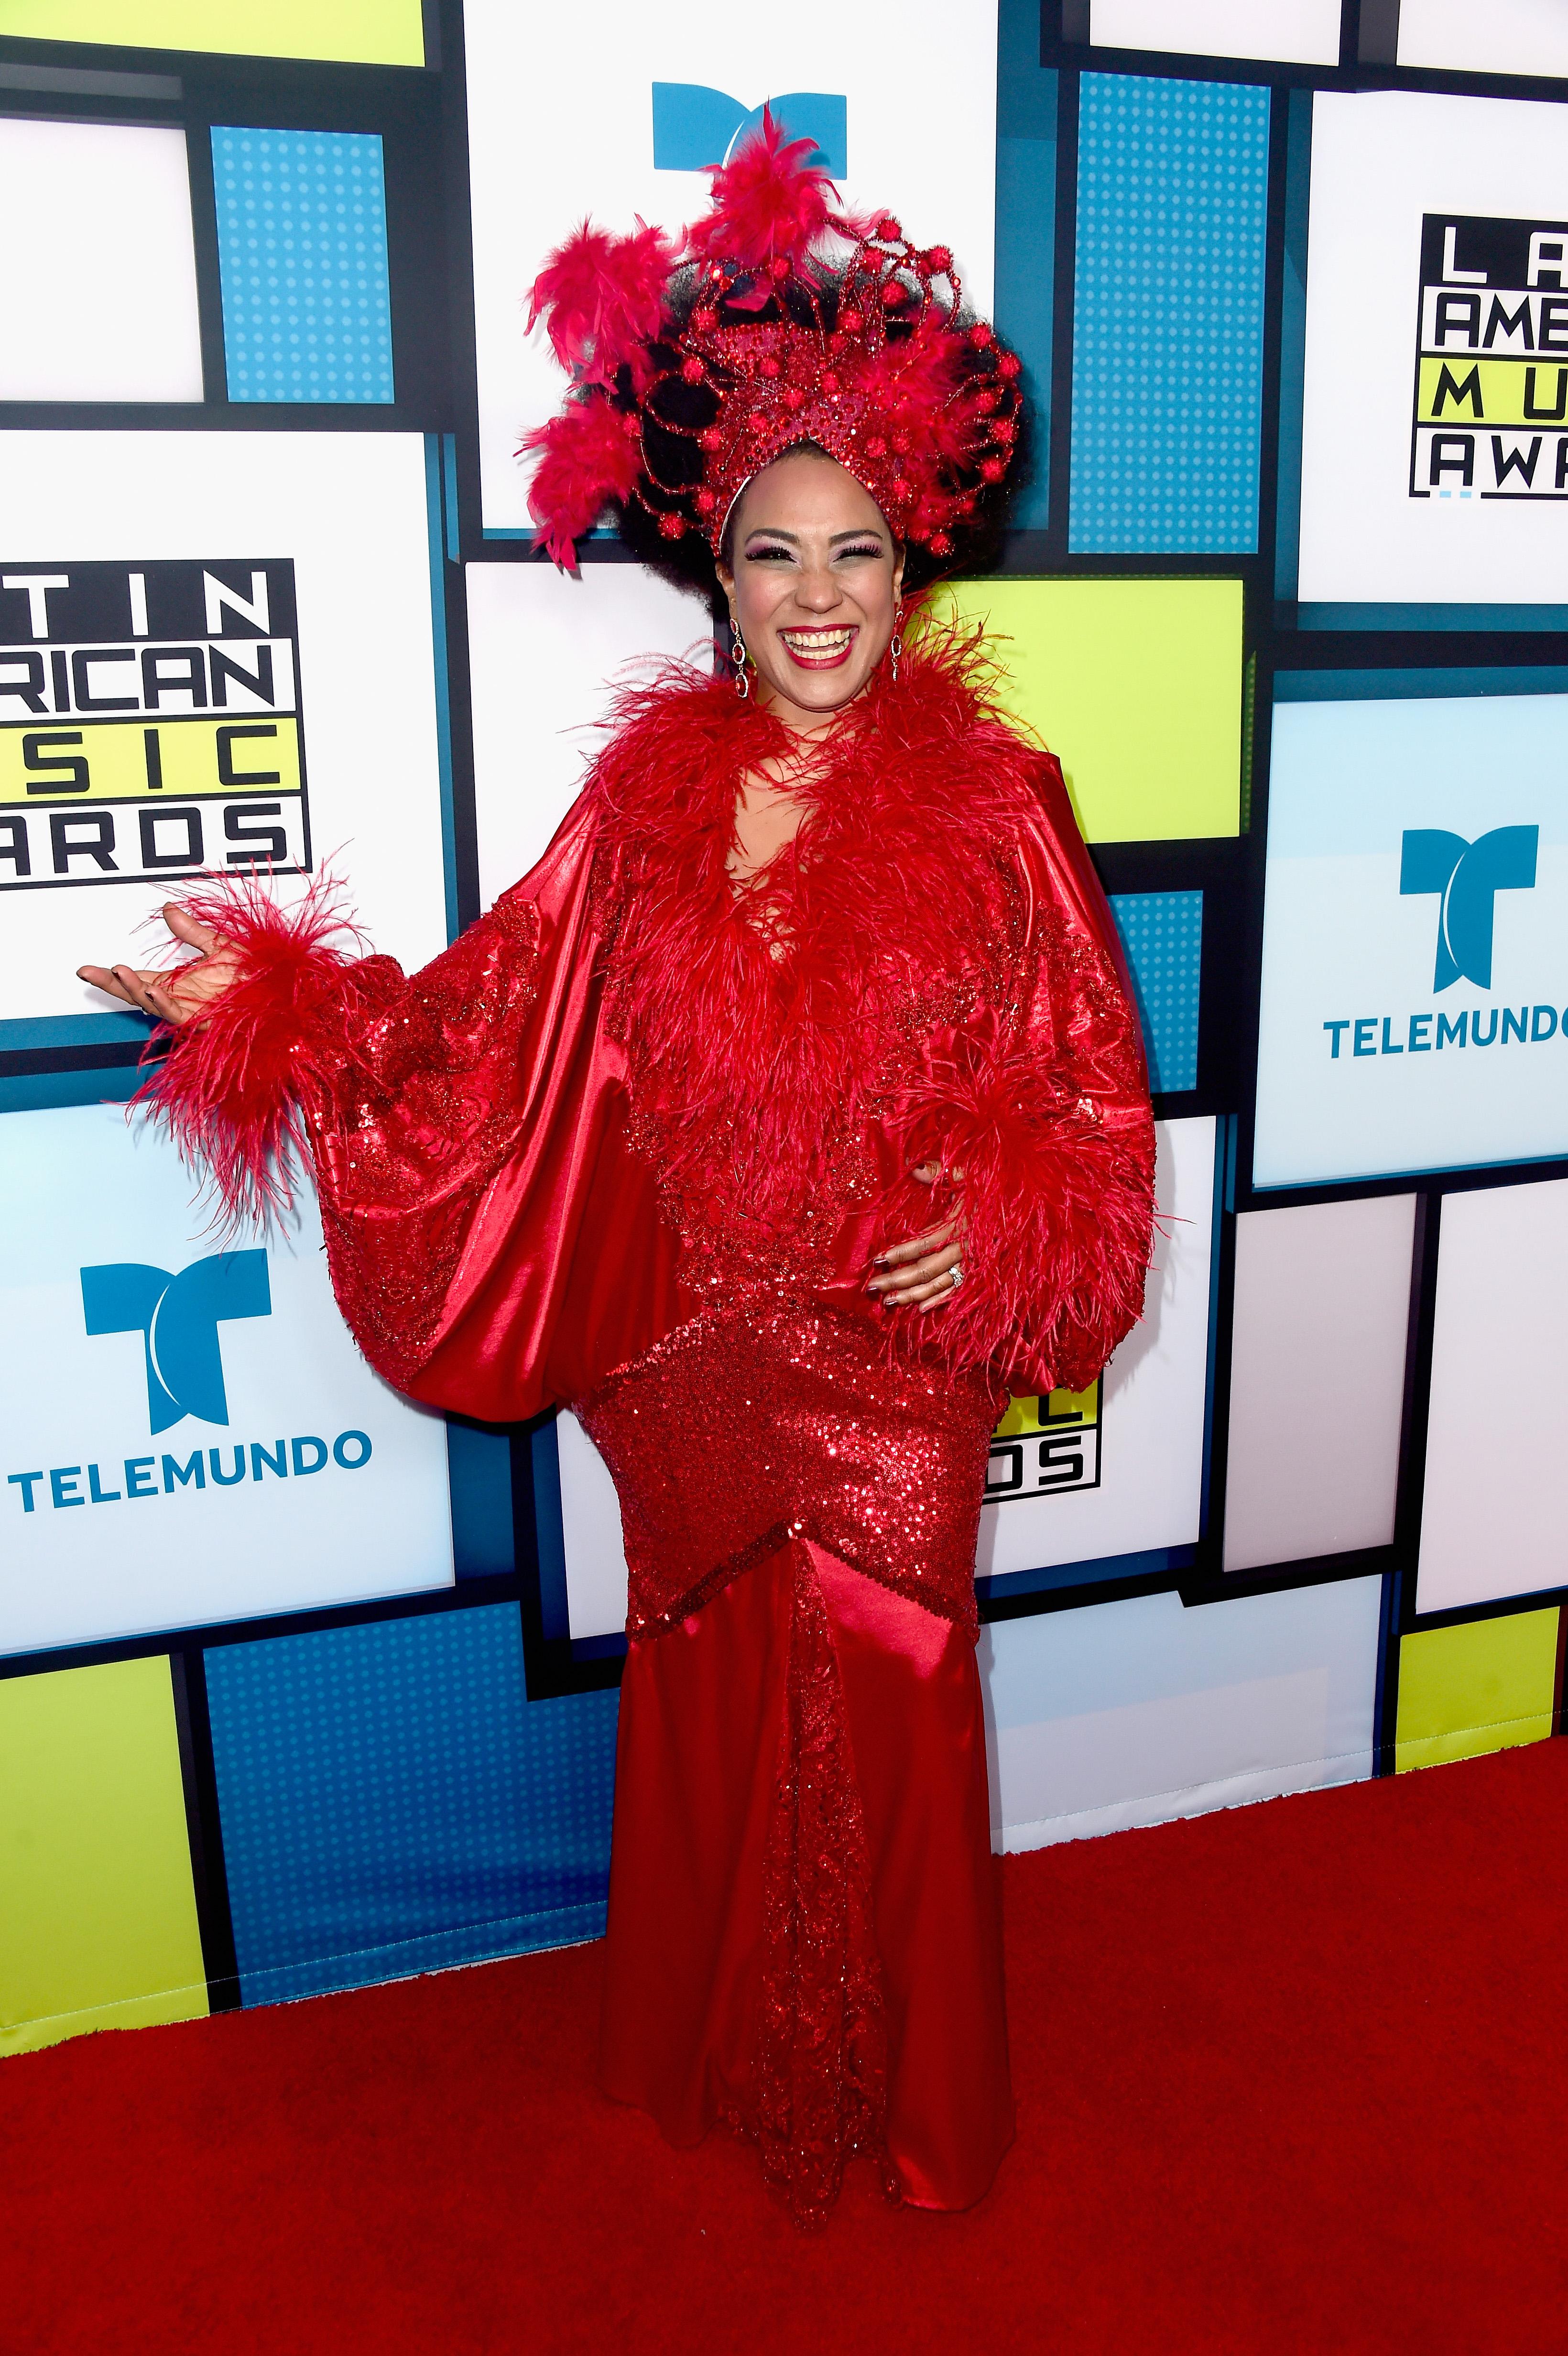 Telemundo's Latin American Music Awards 2015 - Press Room